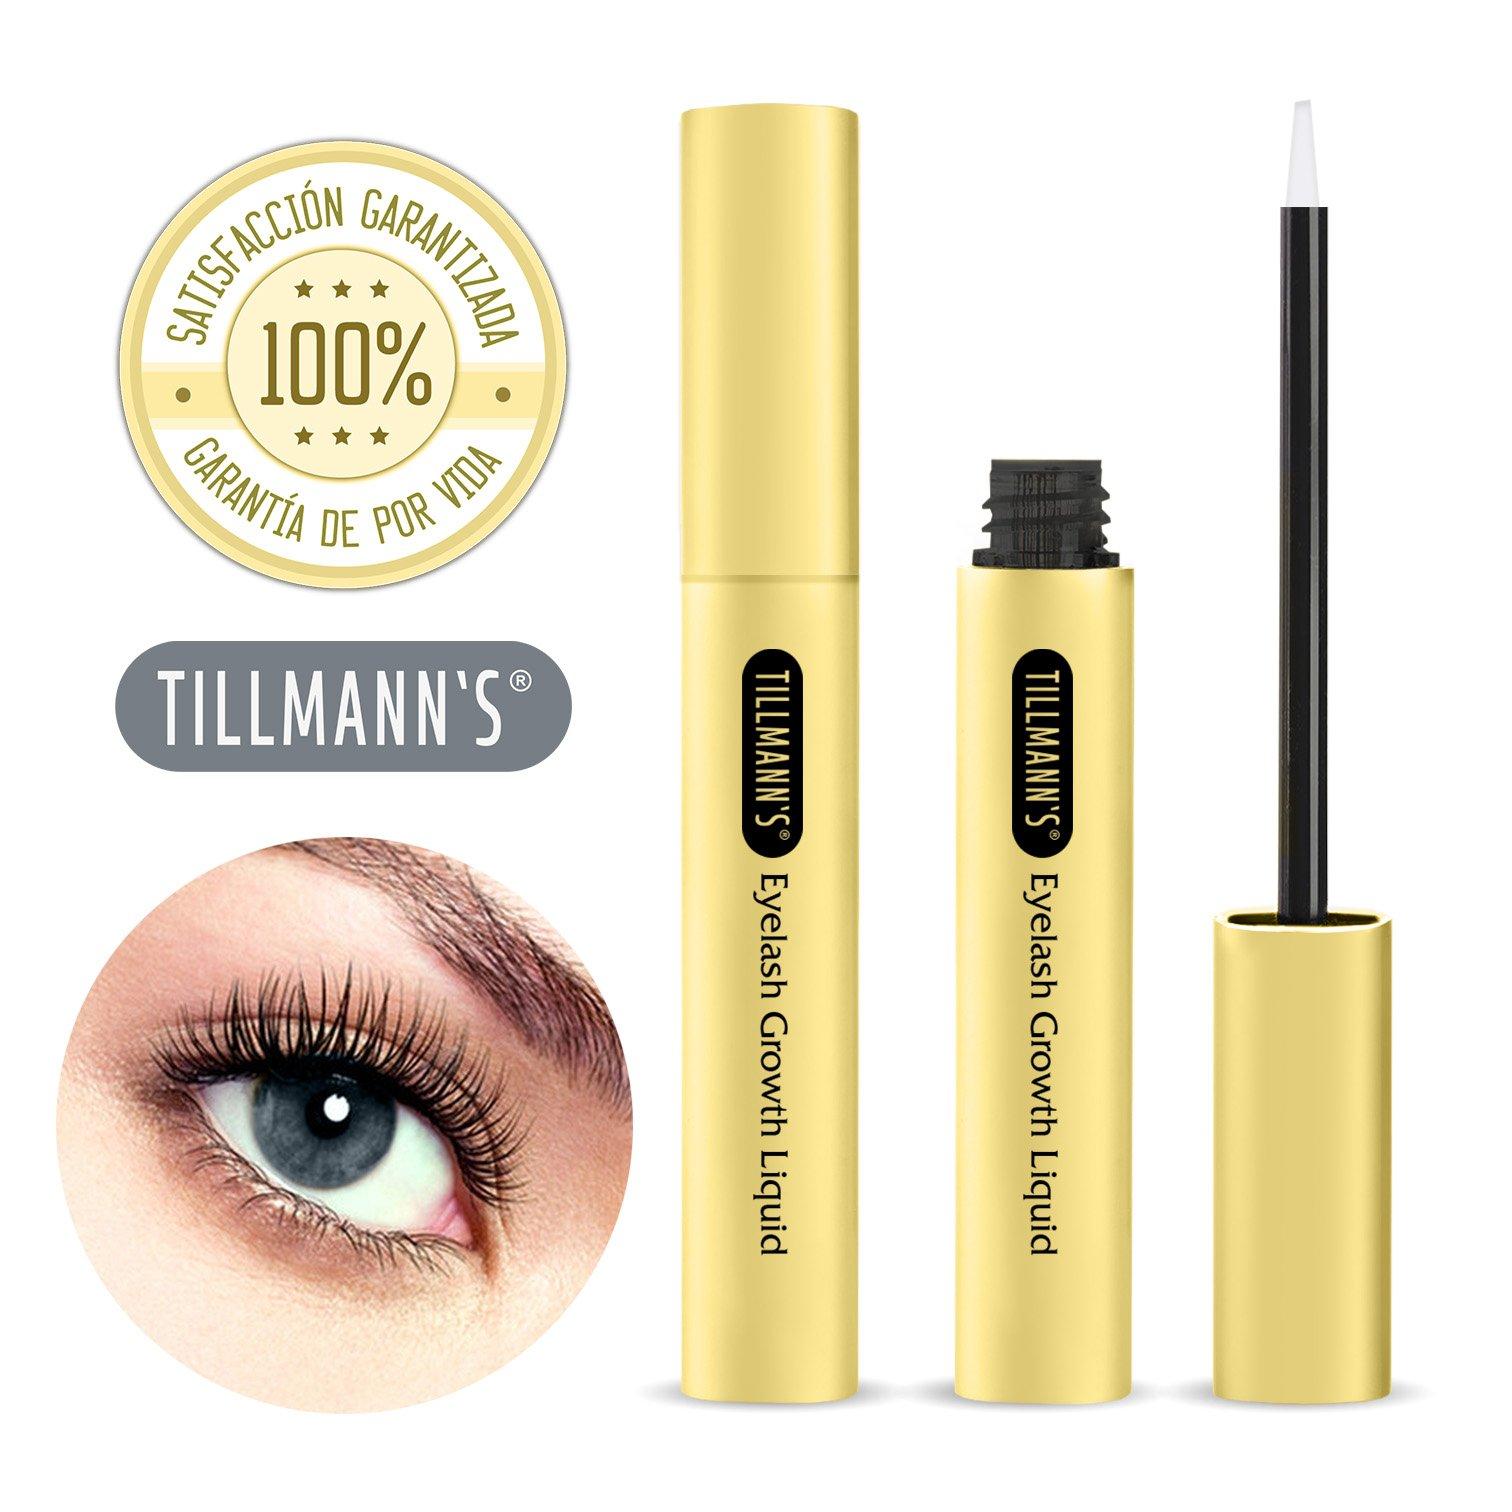 Tillmann's® Serum Pestañas – Crece Pestañas Tratamiento – Para Tener Pestañas Largas Y Volumen